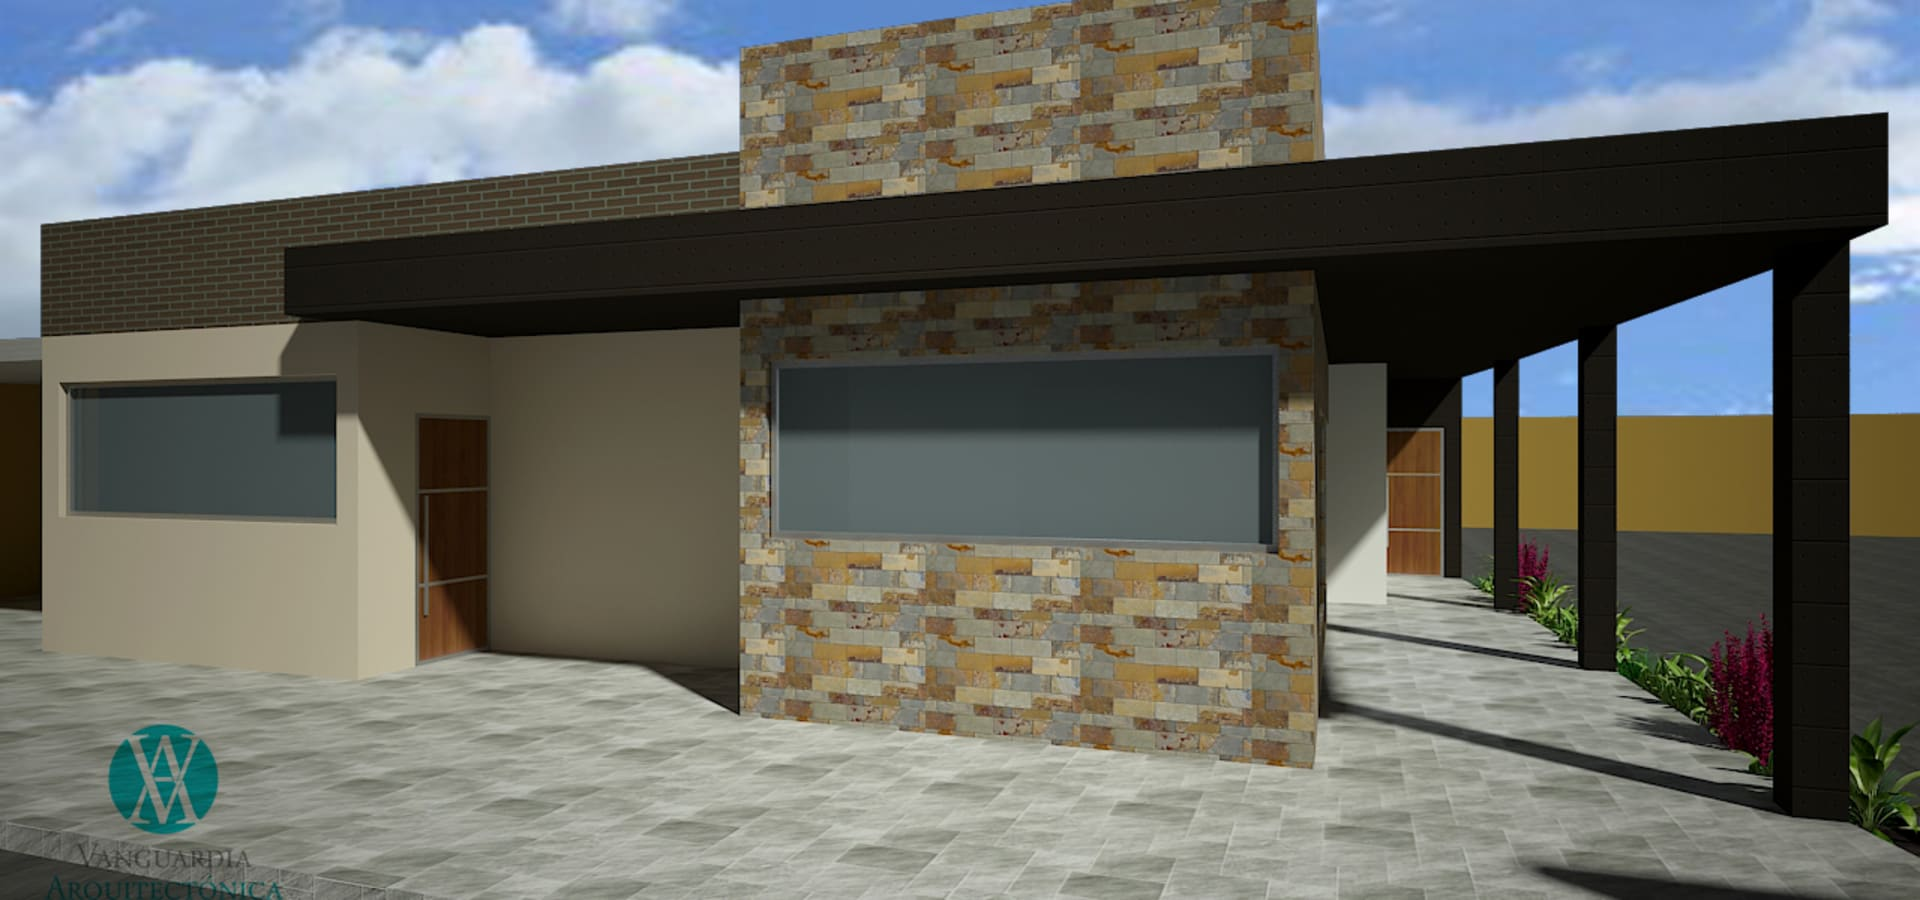 Vanguardia Arquitectónica